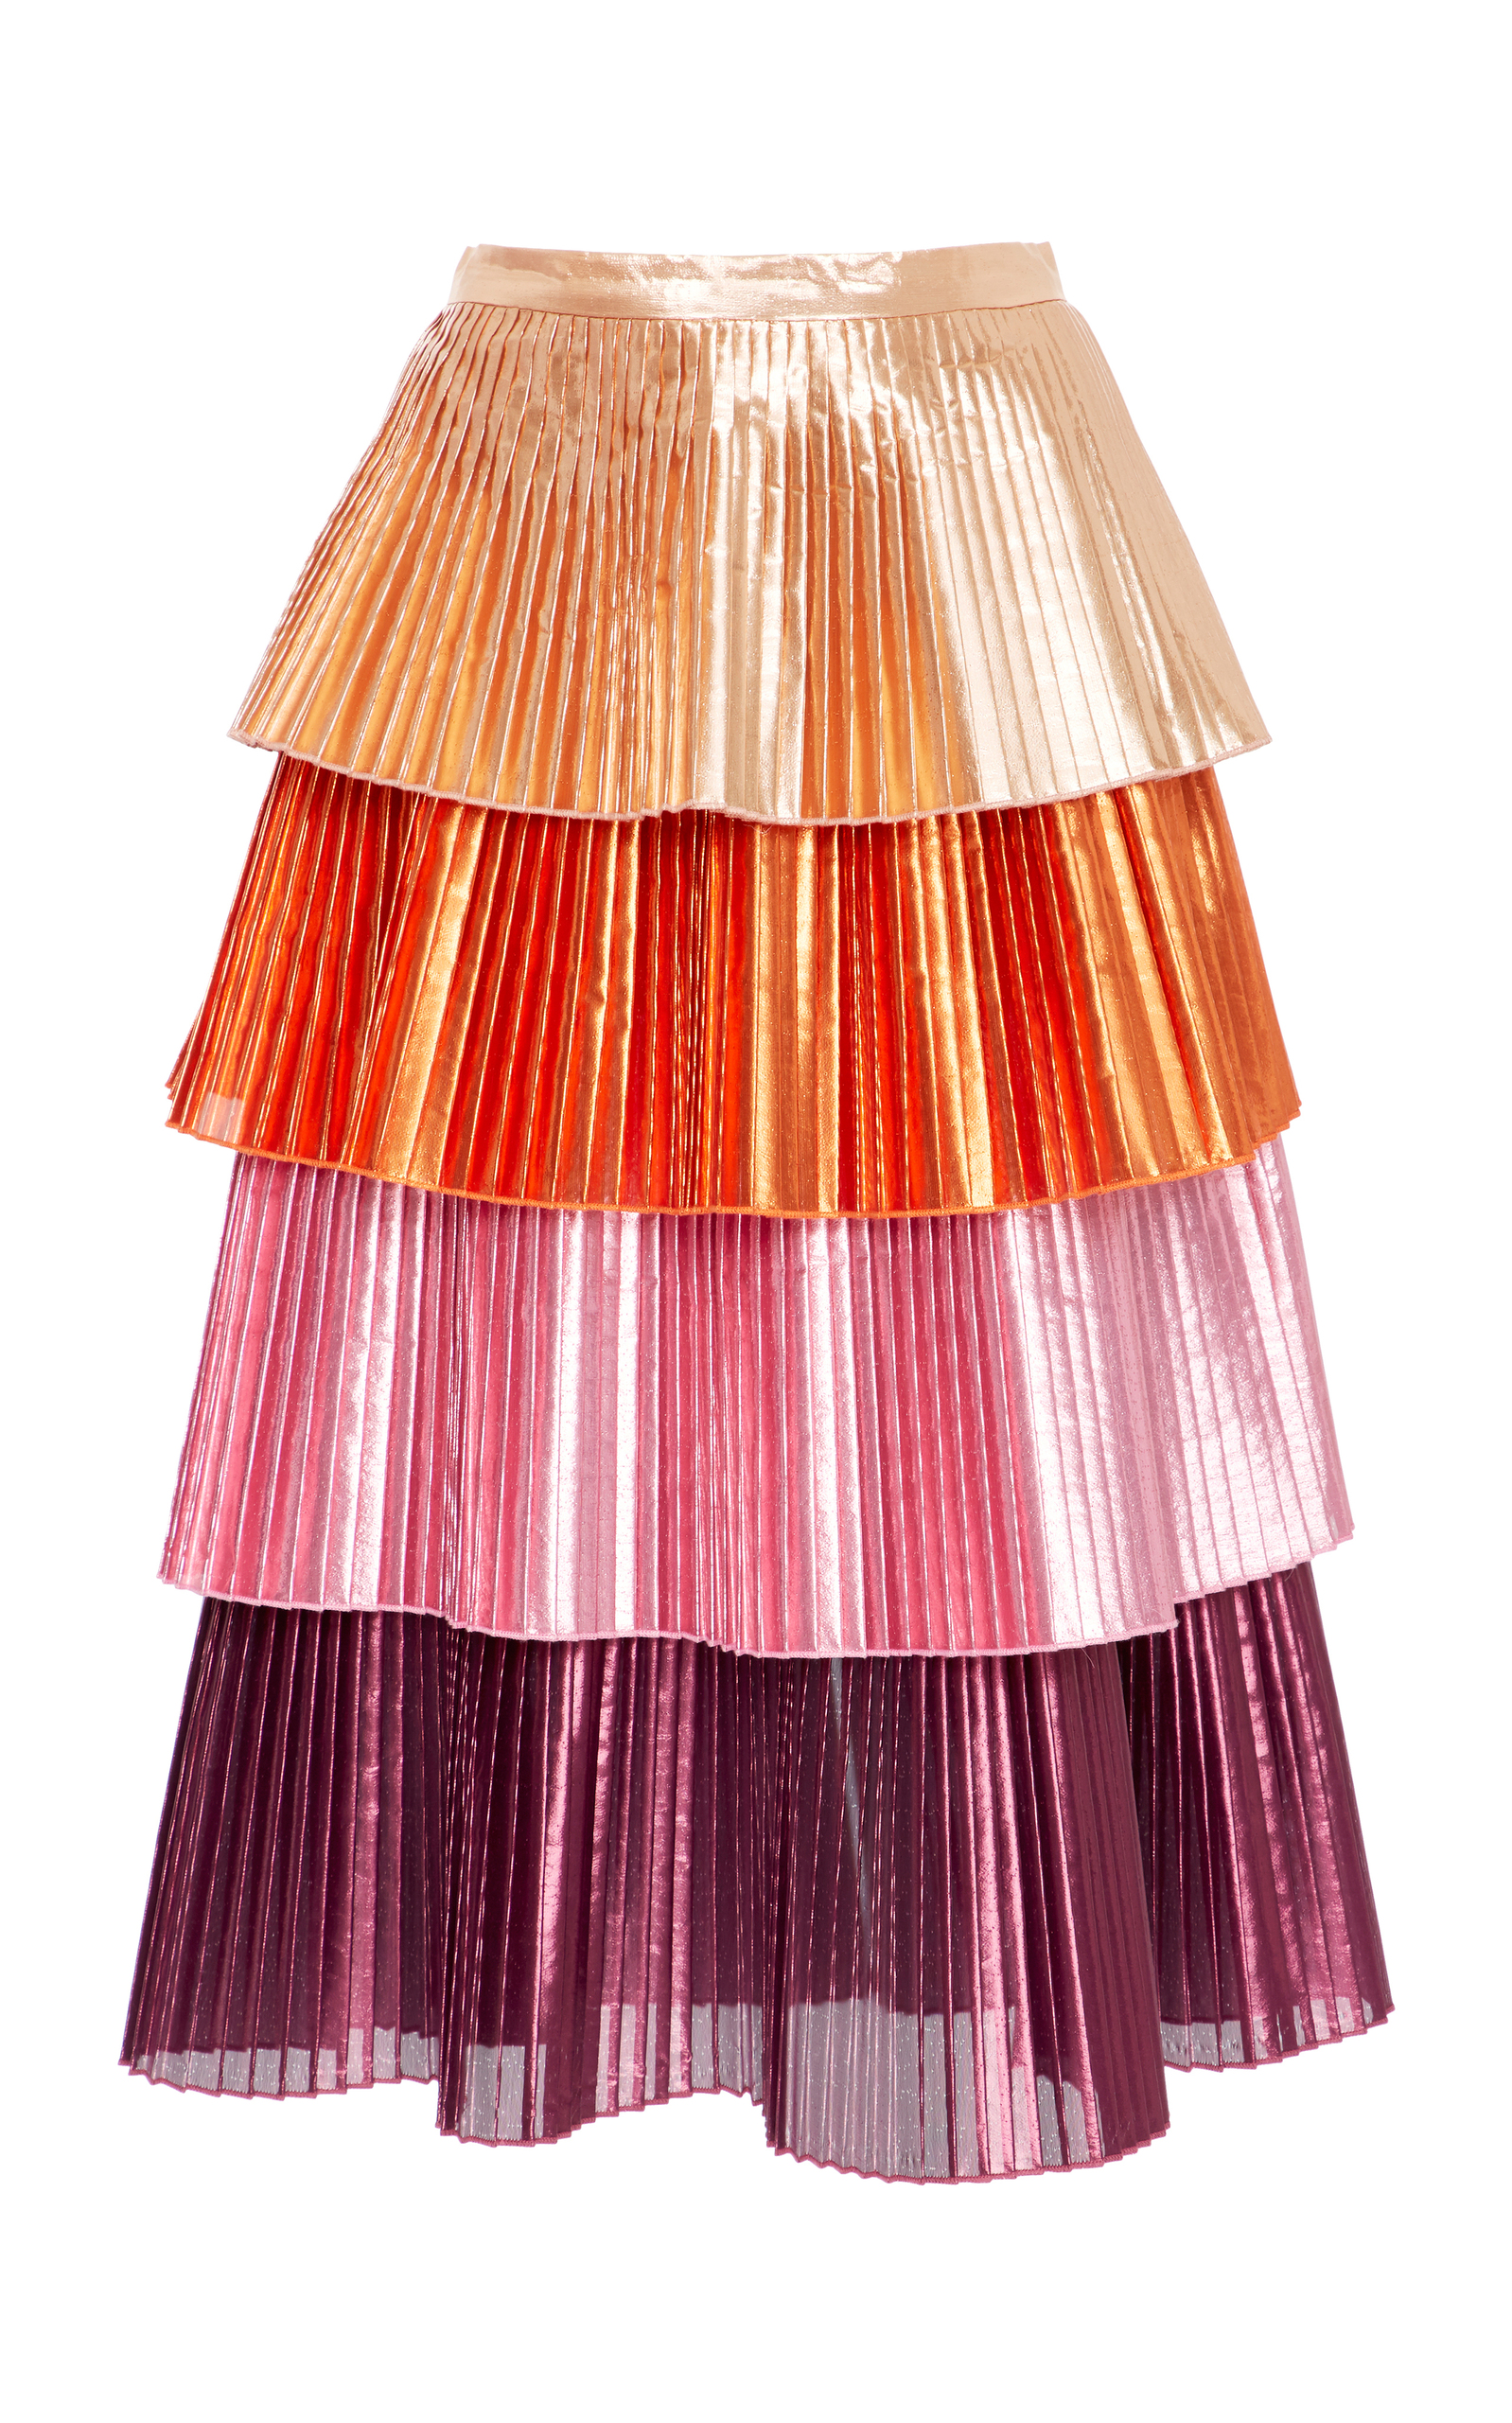 35259c93a Lauren Tiered Skirt by Delfi Collective | Moda Operandi